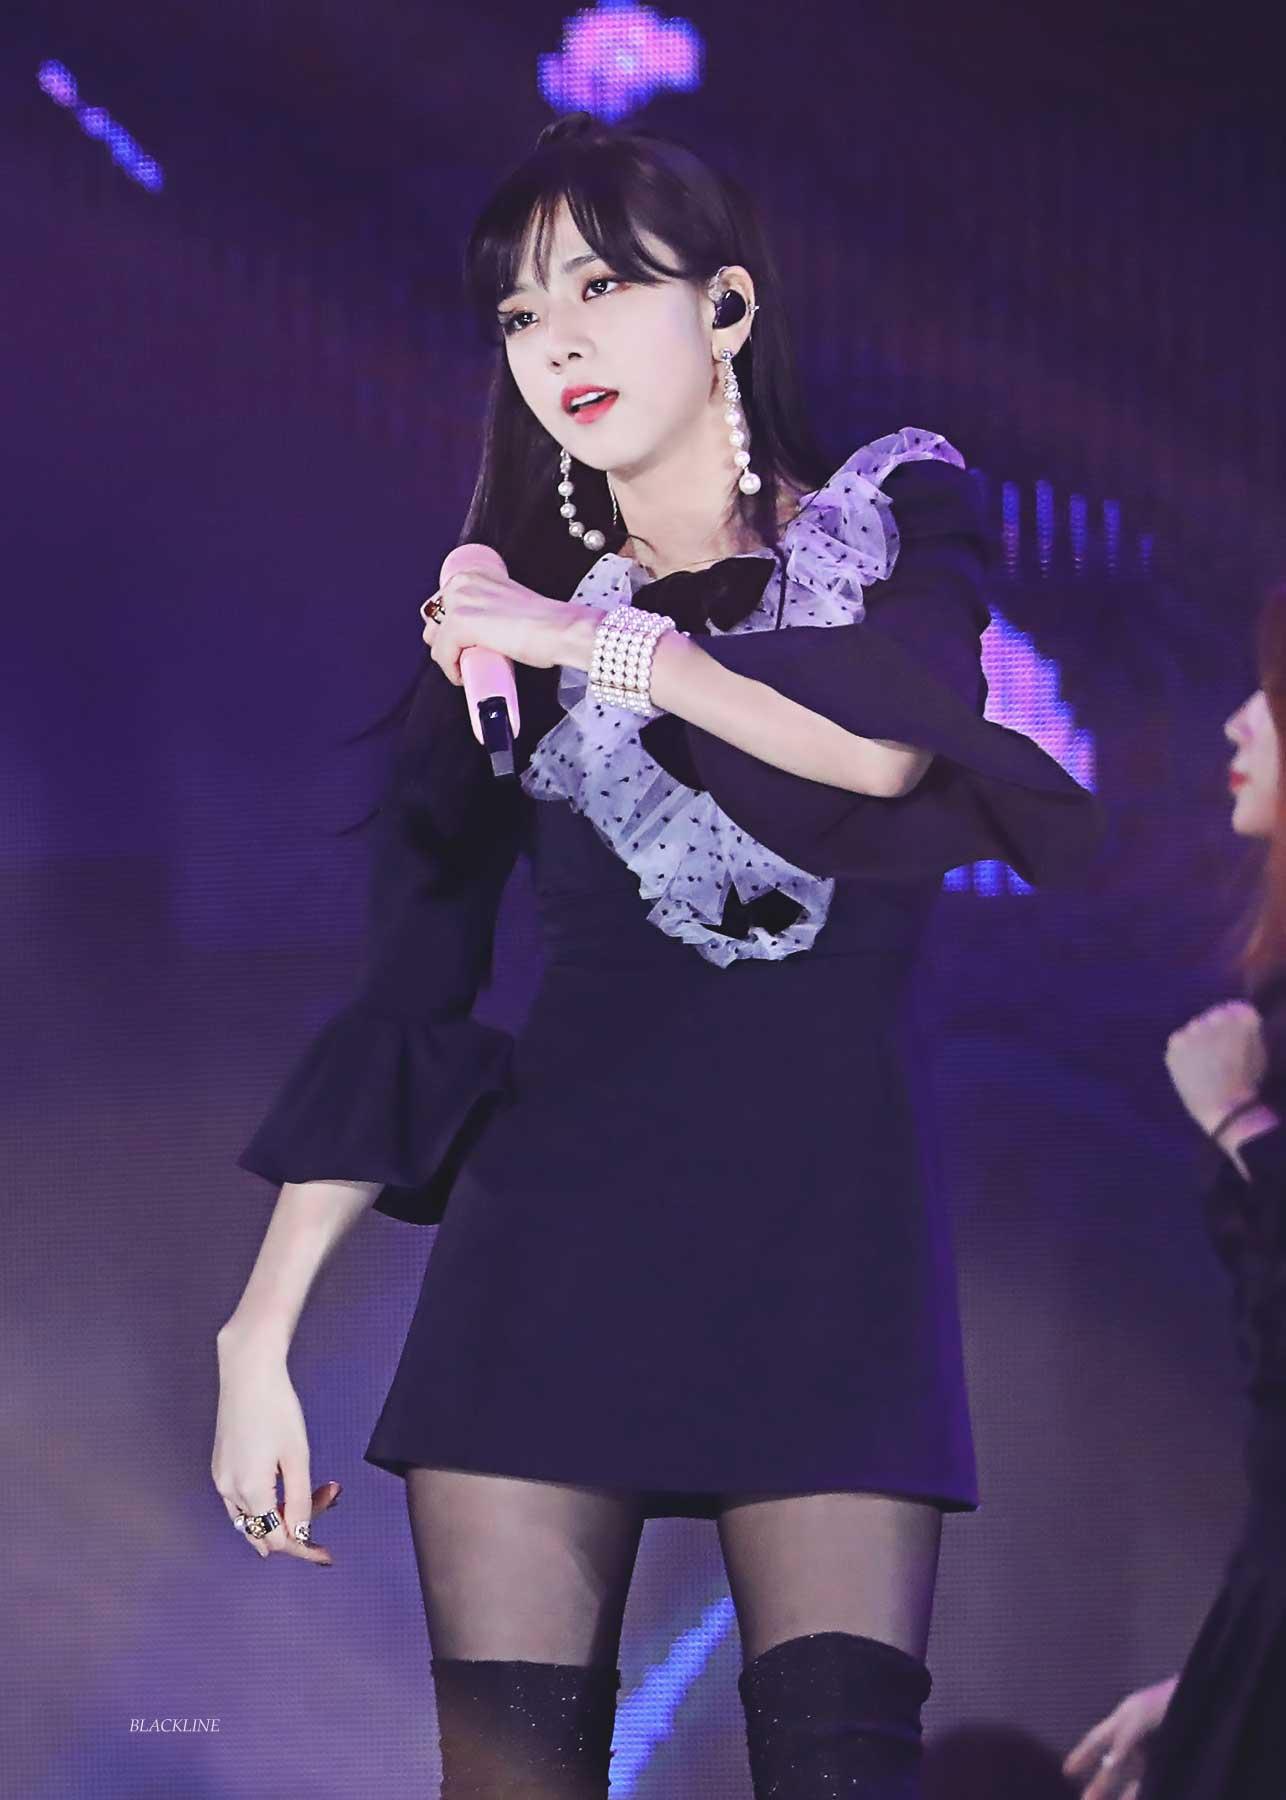 Blackpink Jisoo Seoul Music Awards 2018